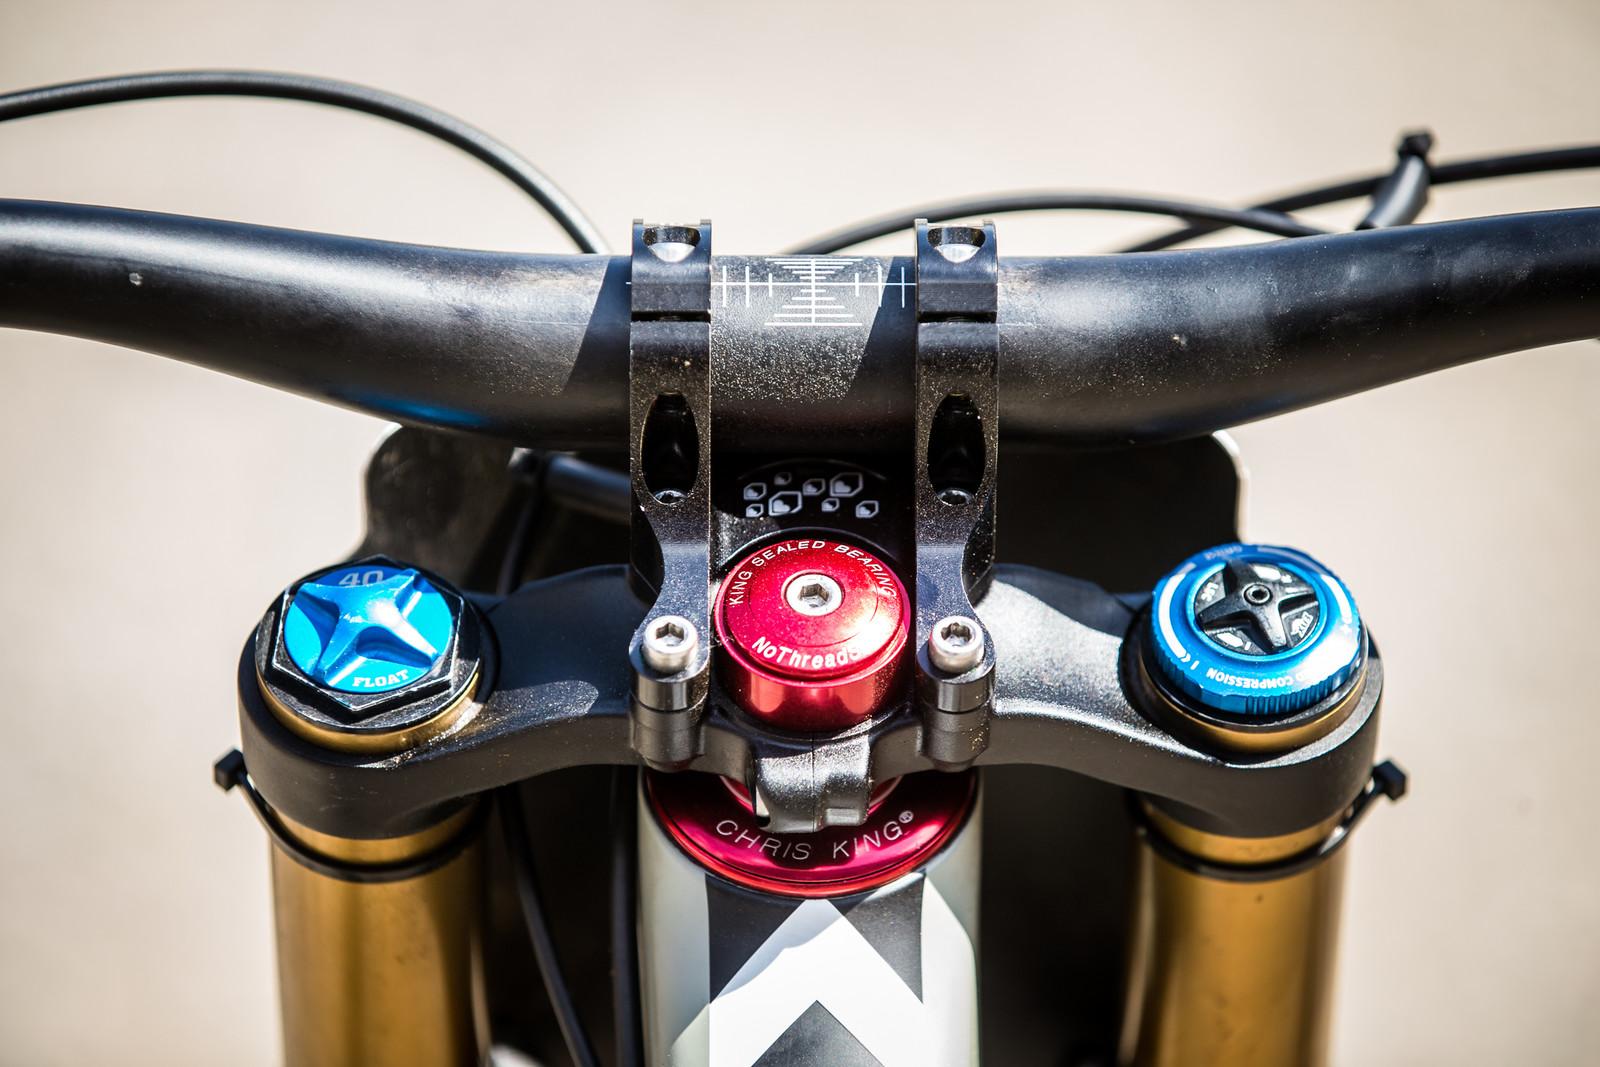 Burgtec Direct-Mount Stem - WINNING BIKE - Loris Vergier's Santa Cruz V10cc 29 - Mountain Biking Pictures - Vital MTB